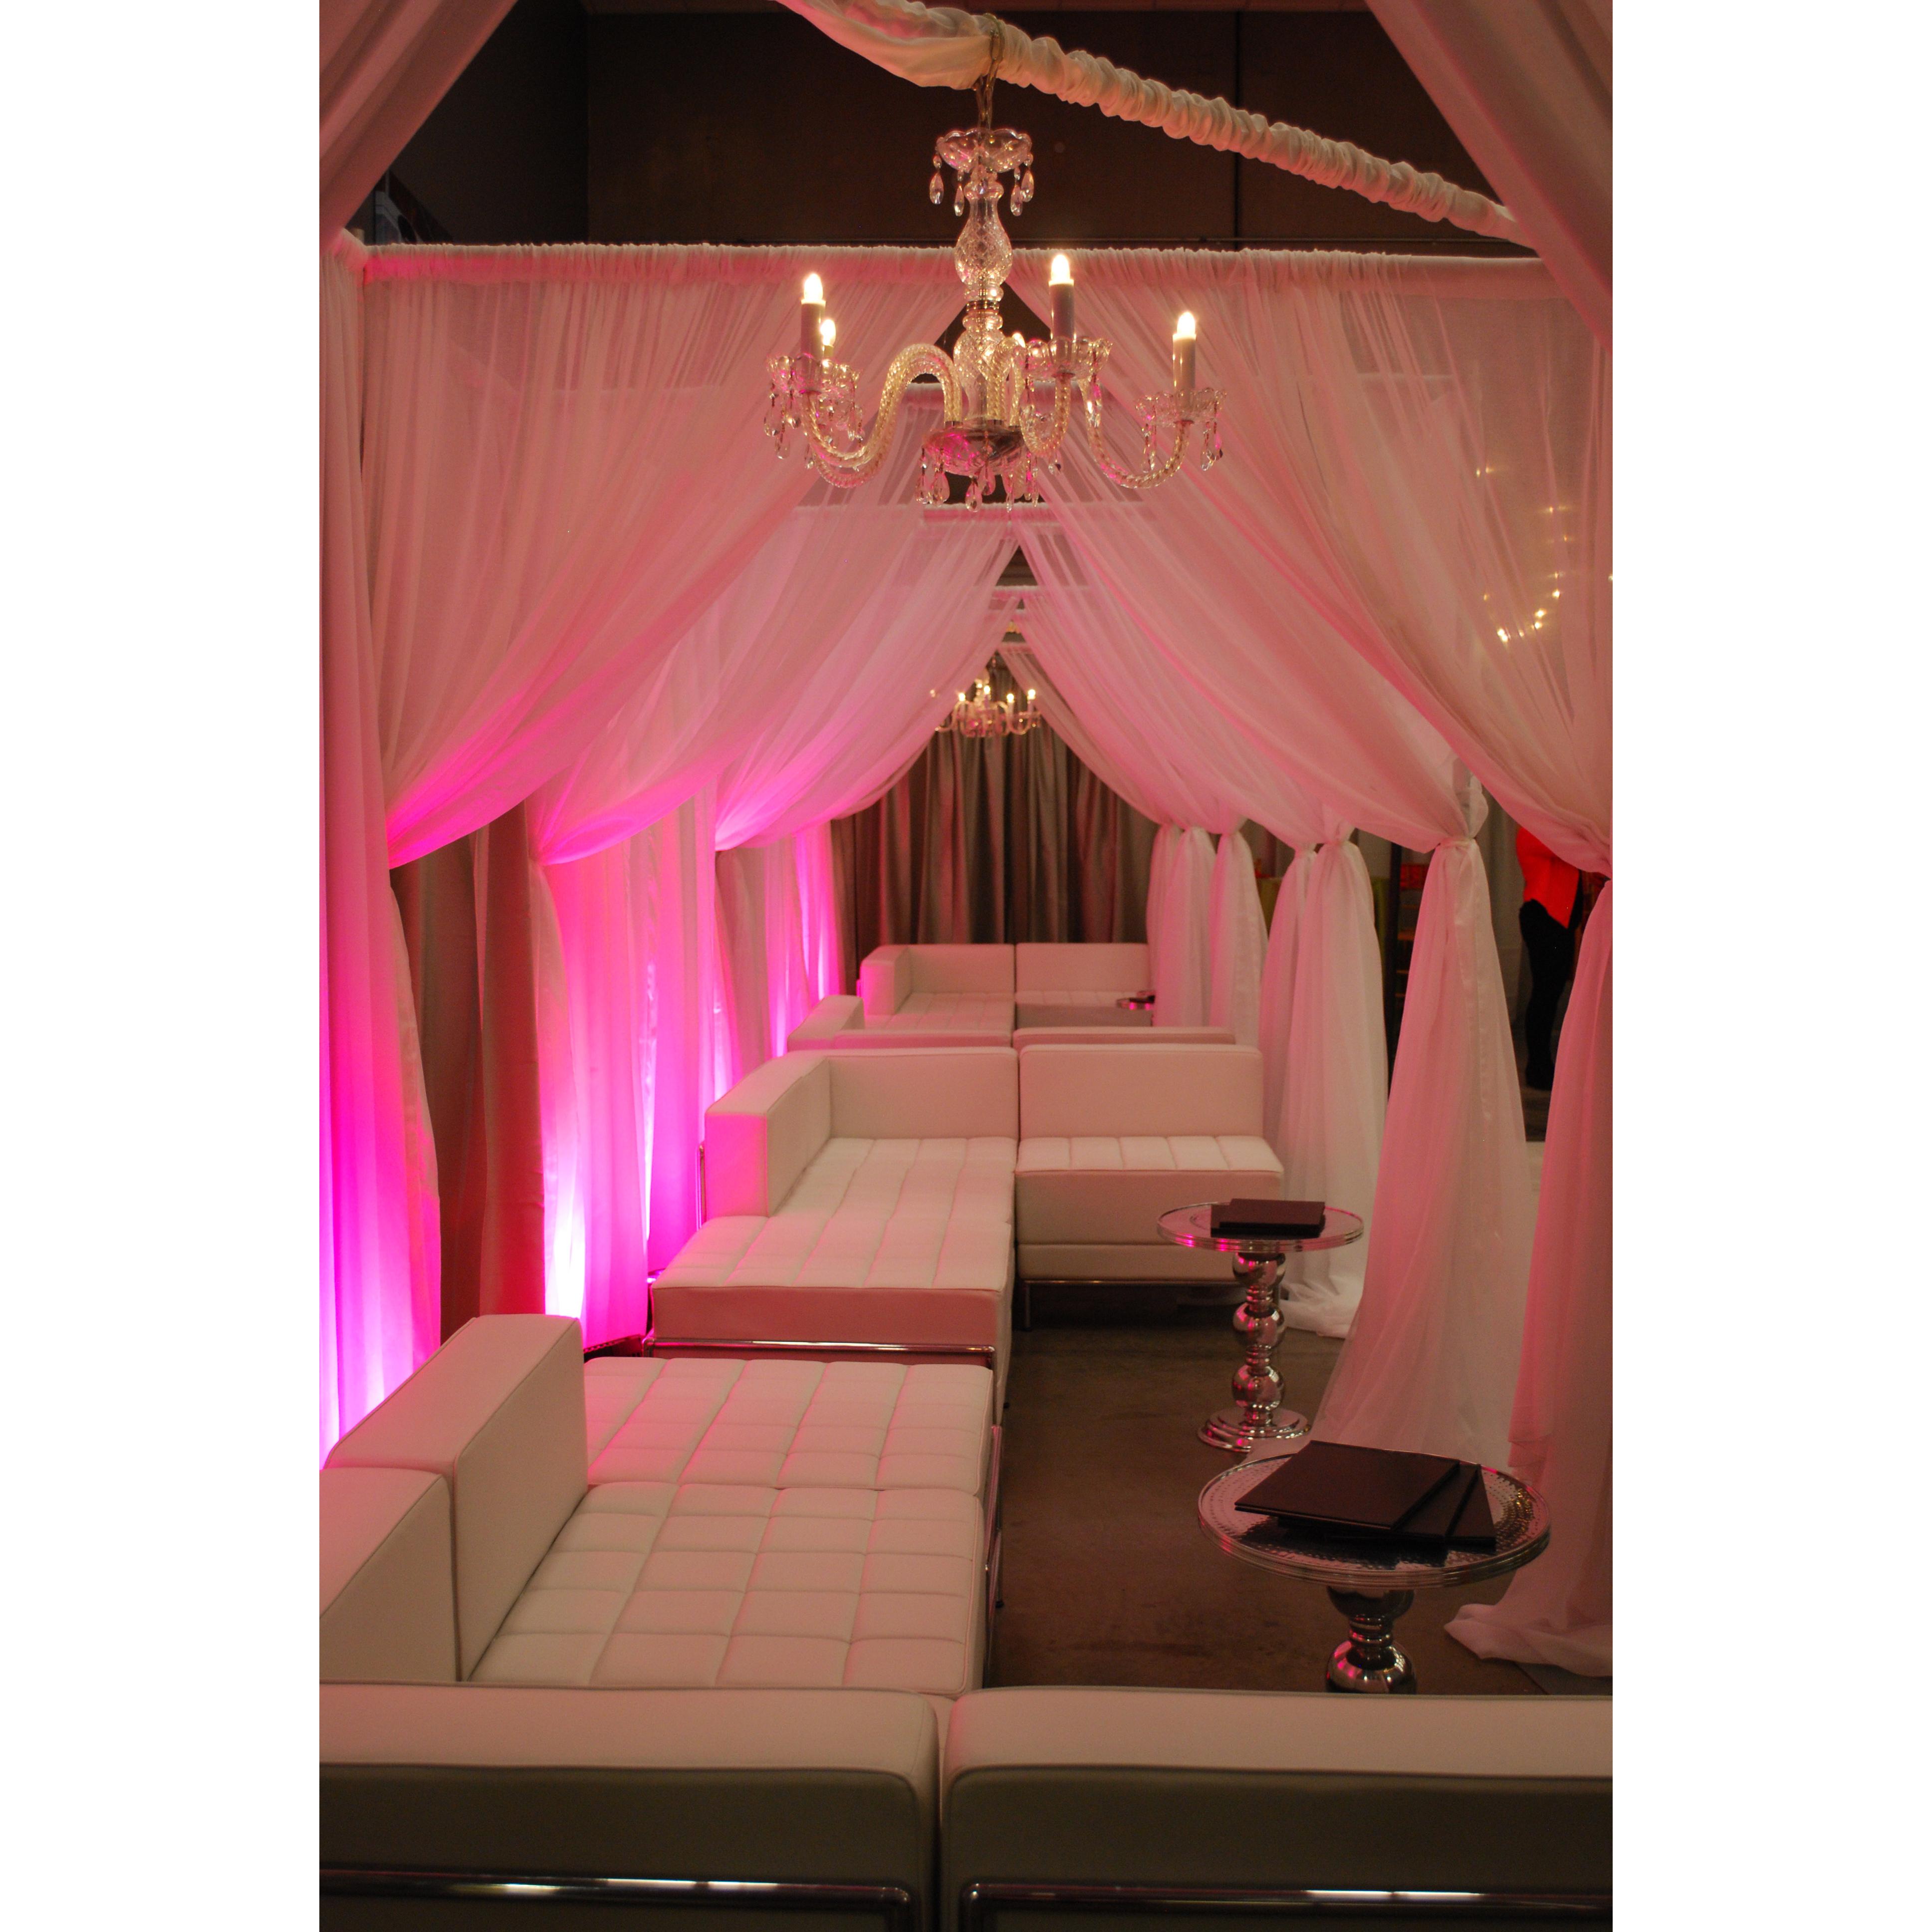 deborahholdman by com entrance for draped eventsplusnashville pipe wedding a best pinterest drapes door images draping on weddings elegant and